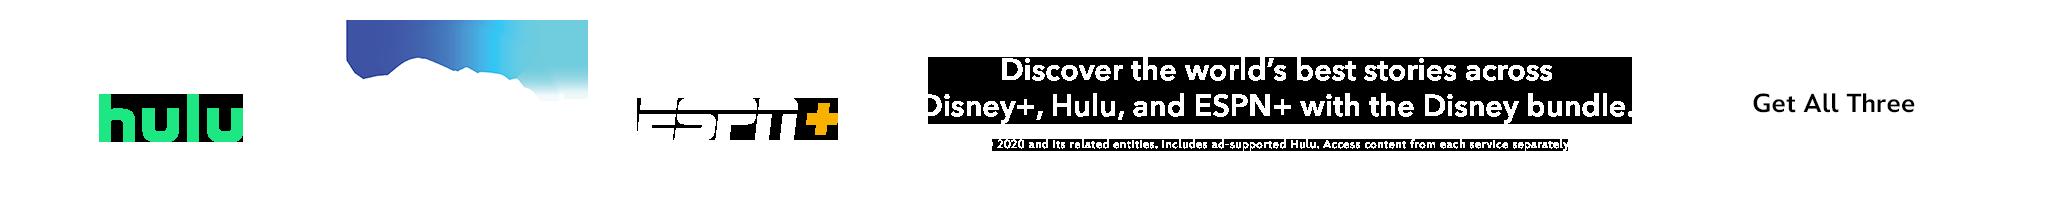 Disney+ | Hulu | ESPN+ | Discover the world's best stories across Disney+, Hulu, and ESPN+ with the Disney bundle. | Get all Three.